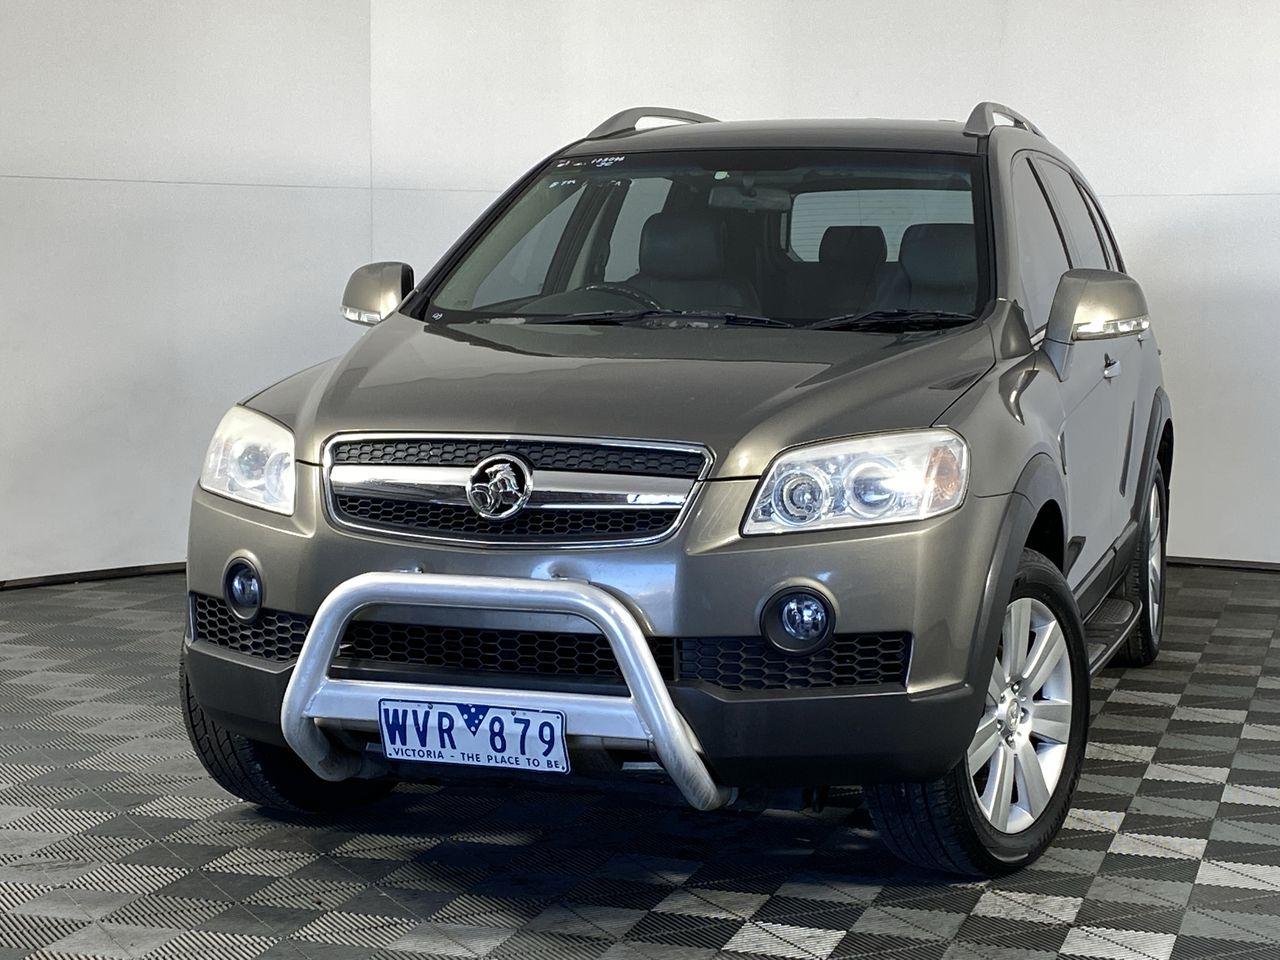 2008 Holden Captiva LX (4x4) CG Automatic 7 Seats Wagon